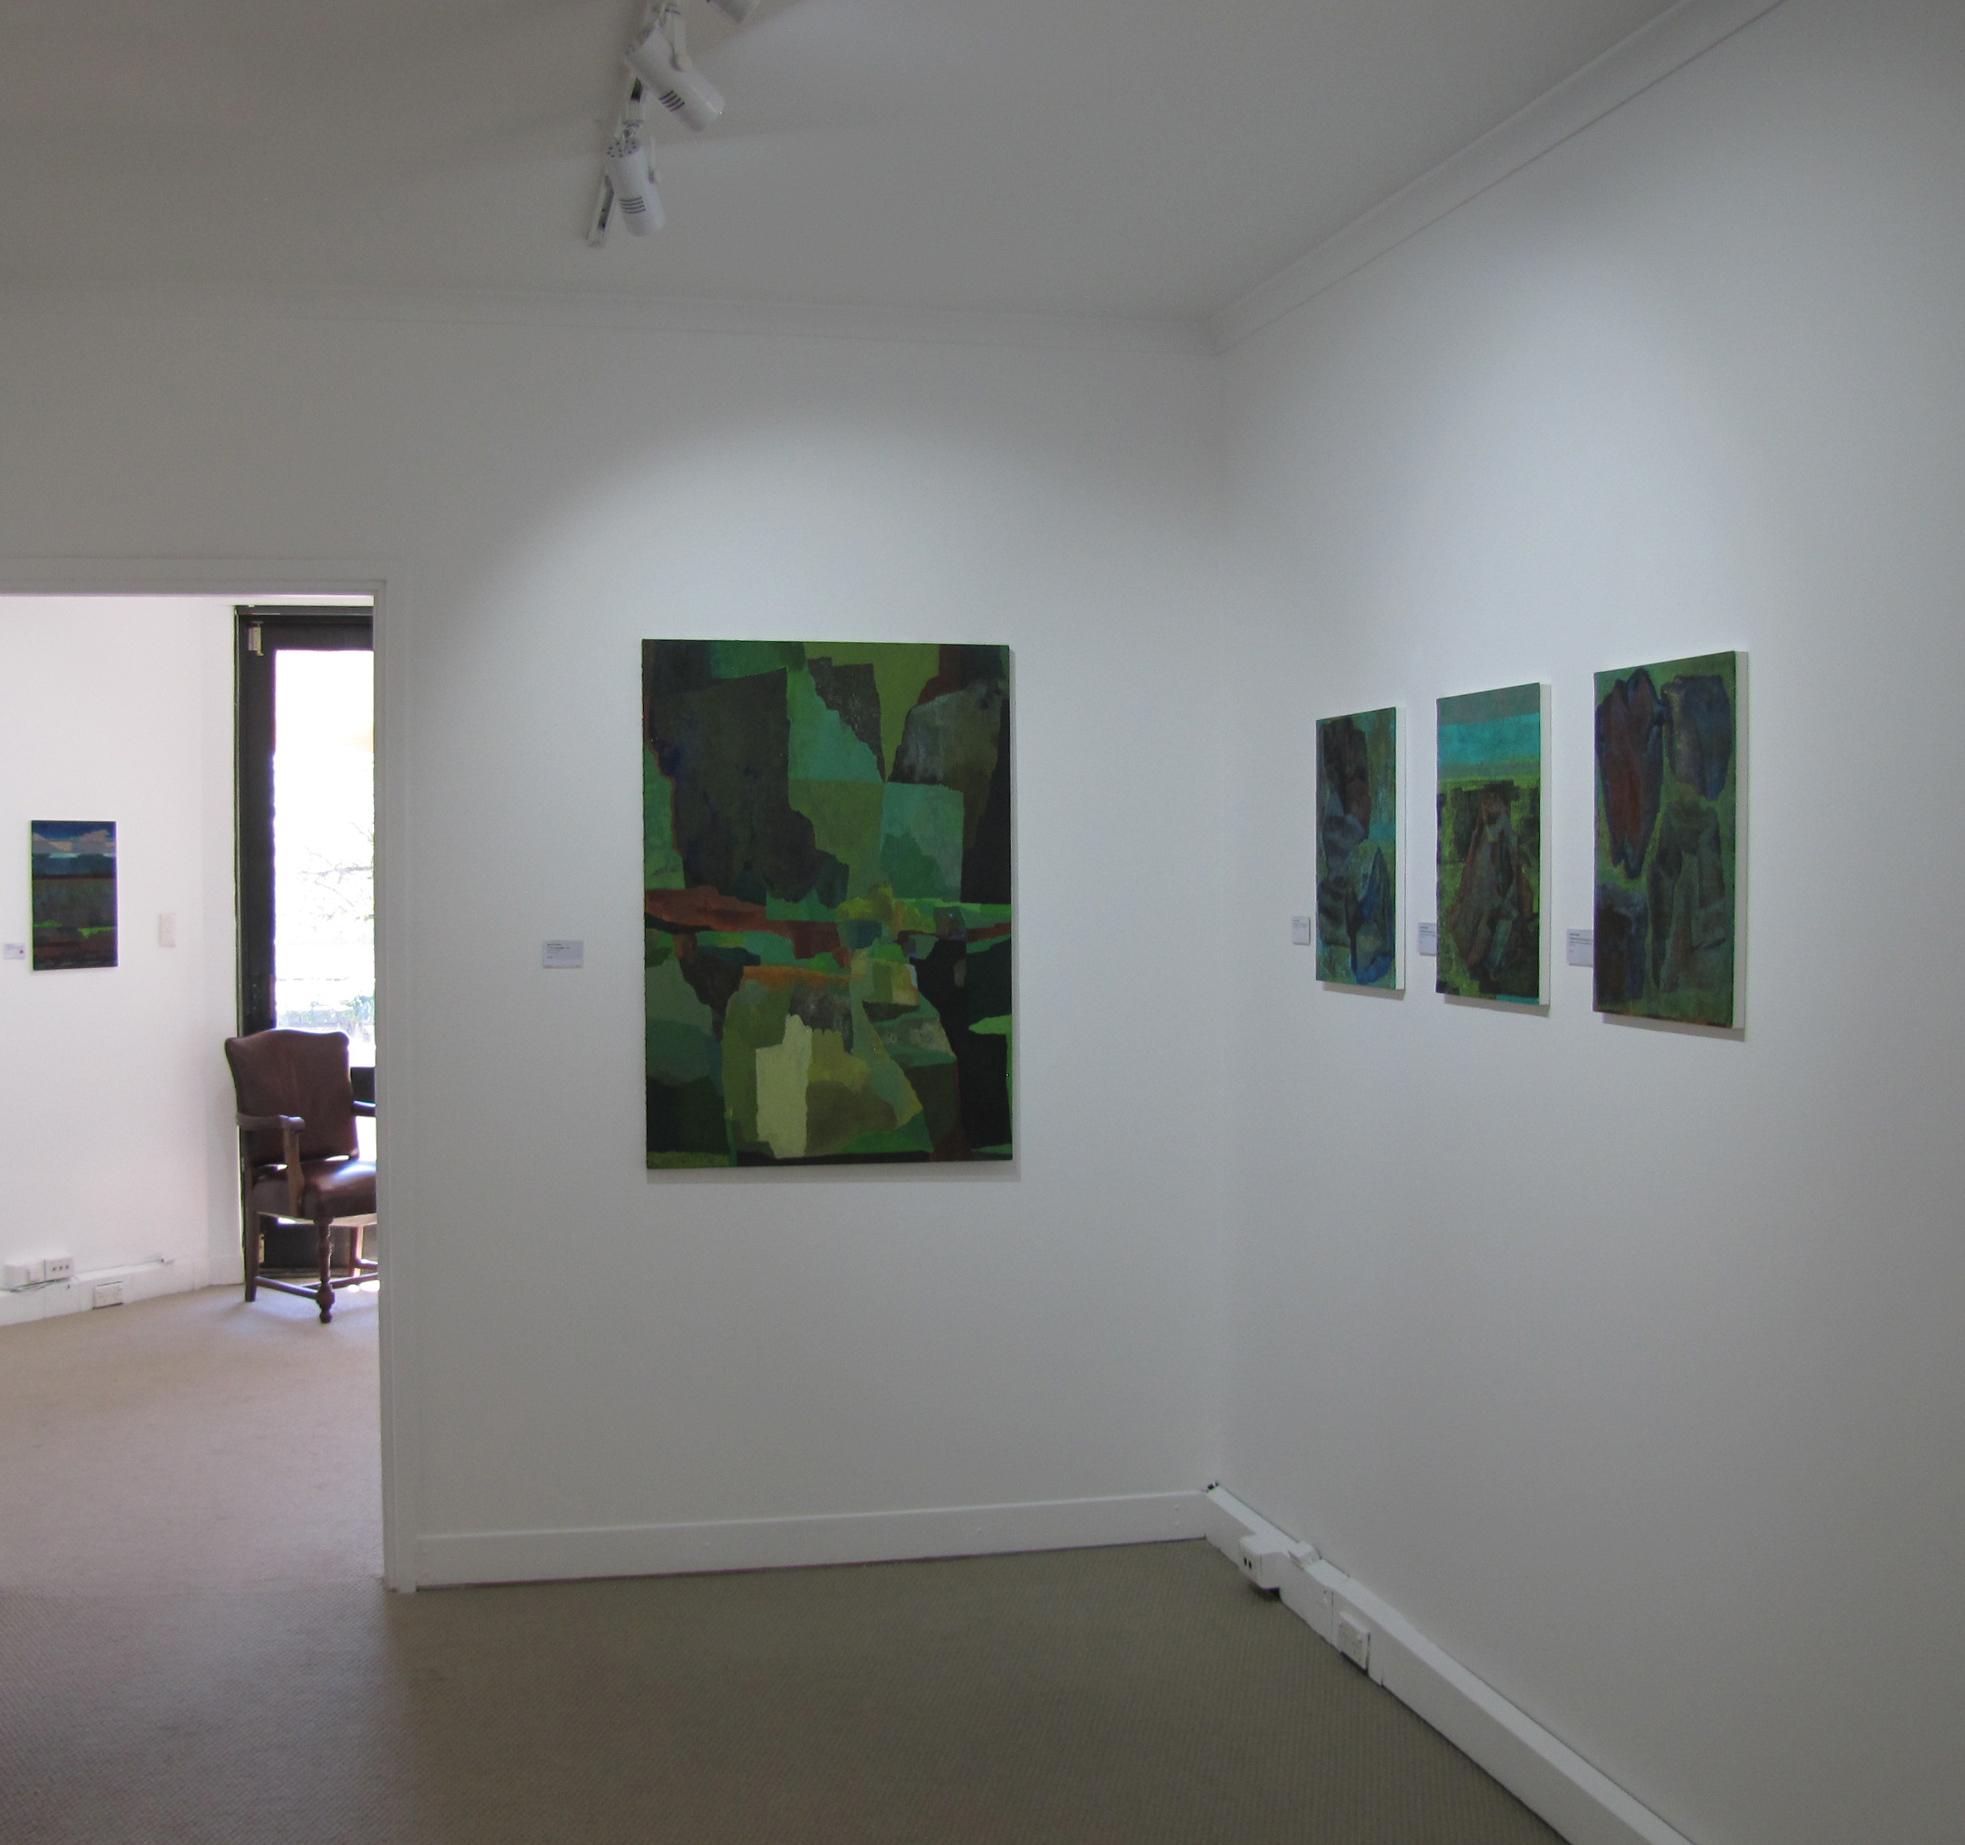 NSG. Waller 2 exhibition. Exhibition views 11.jpg